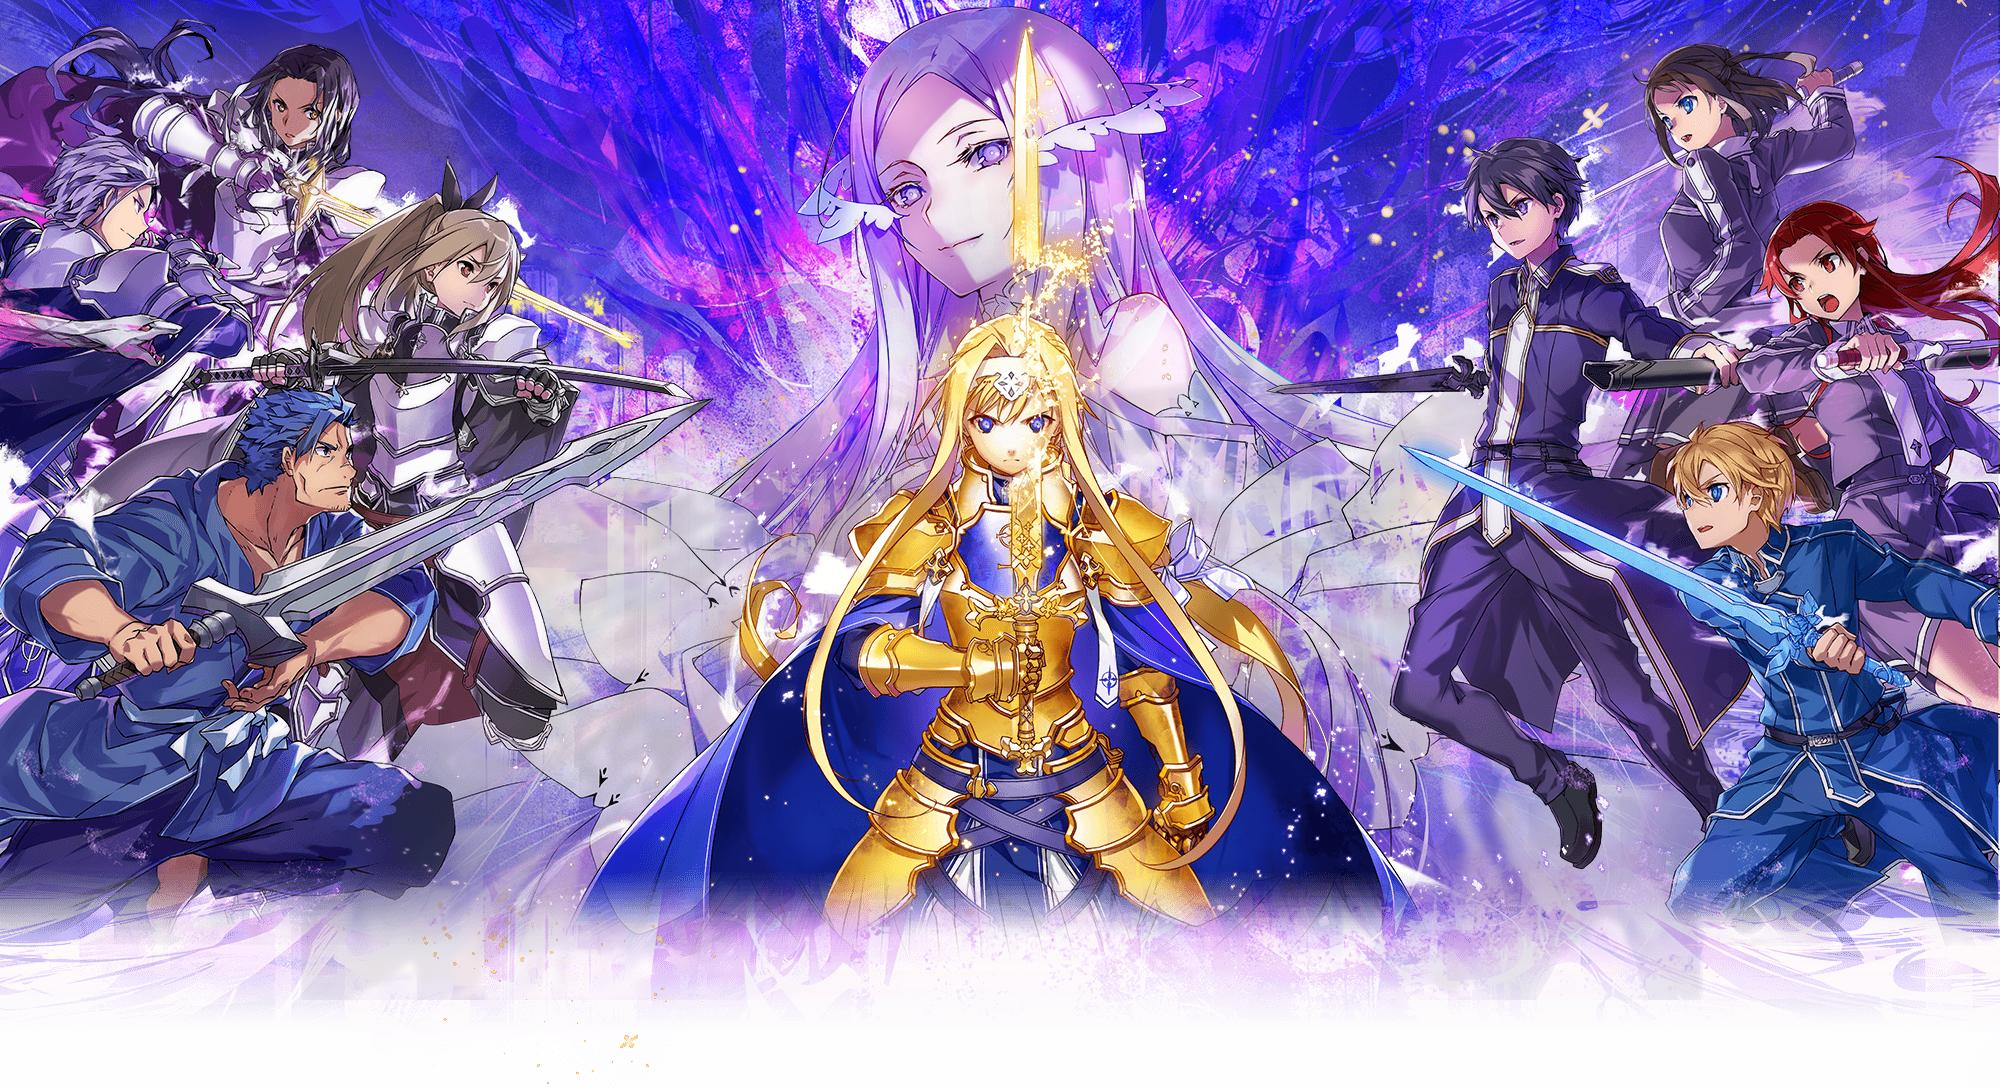 Quinella Sword Art Online Zerochan Anime Image Board